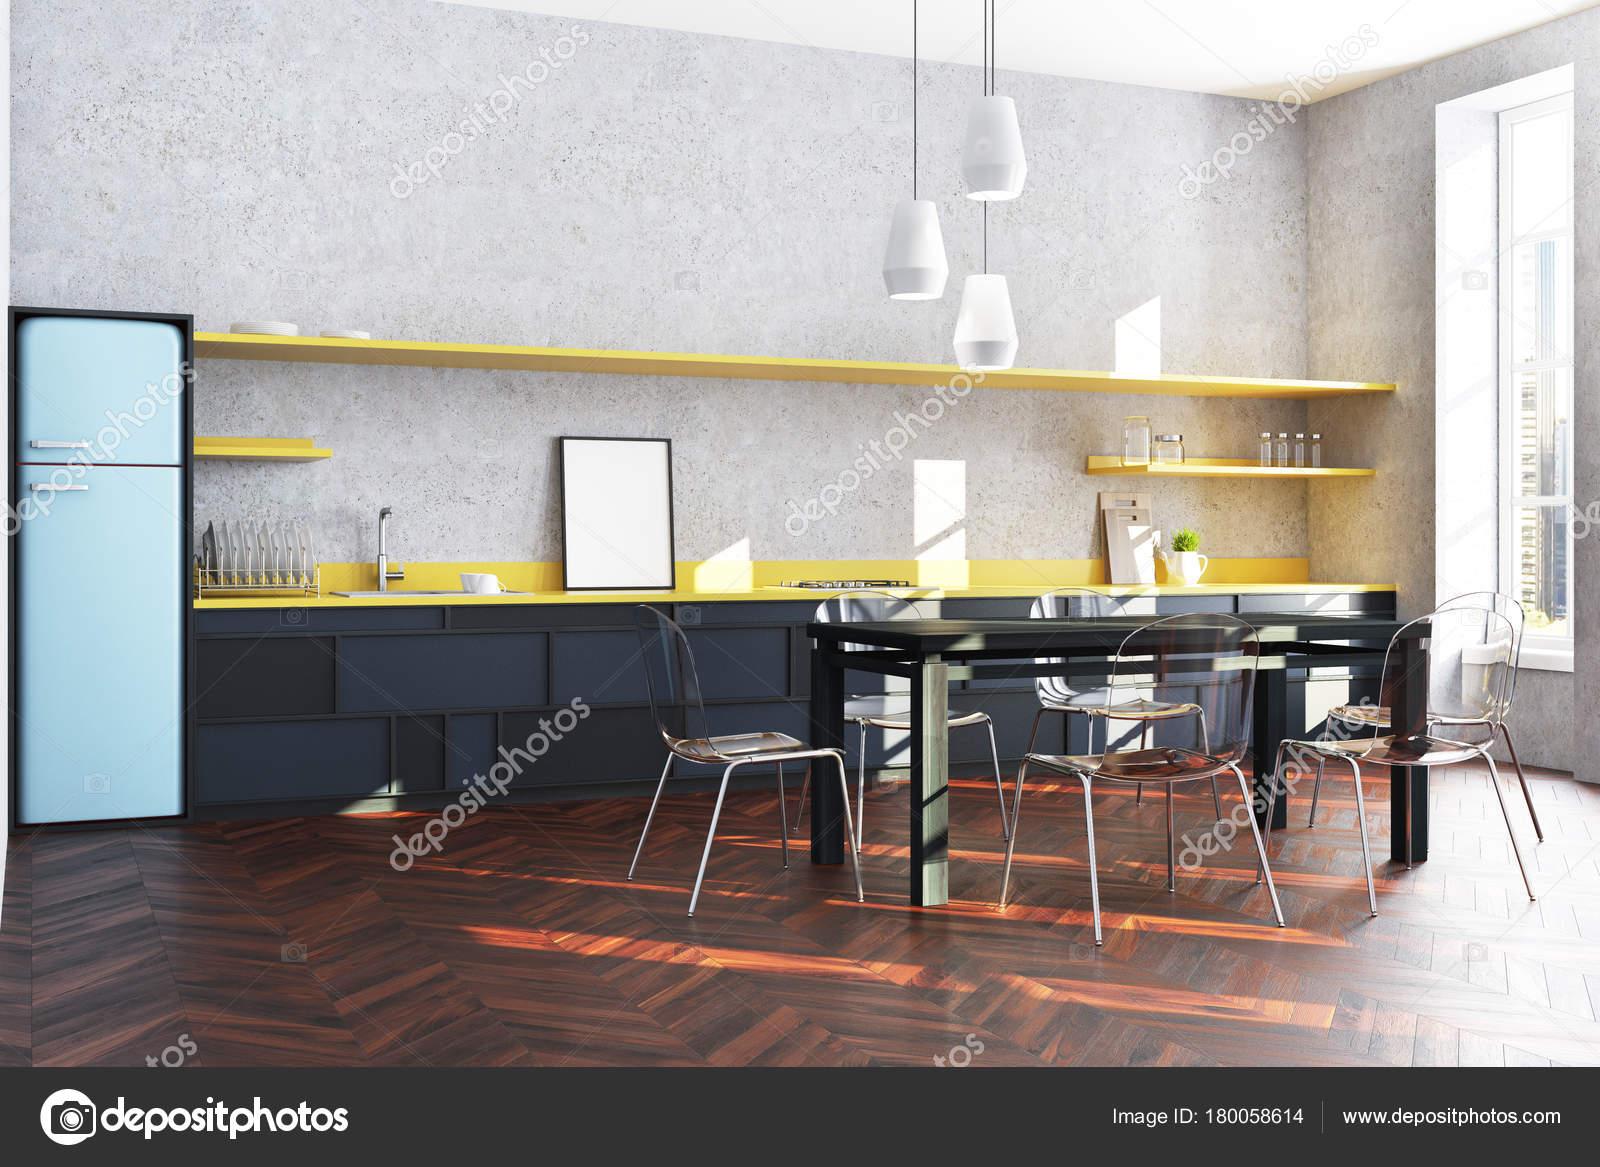 corner bench seating for kitchen how to build cabinet doors 蓝色冰箱厨房角落 图库照片 c denisismagilov 180058614